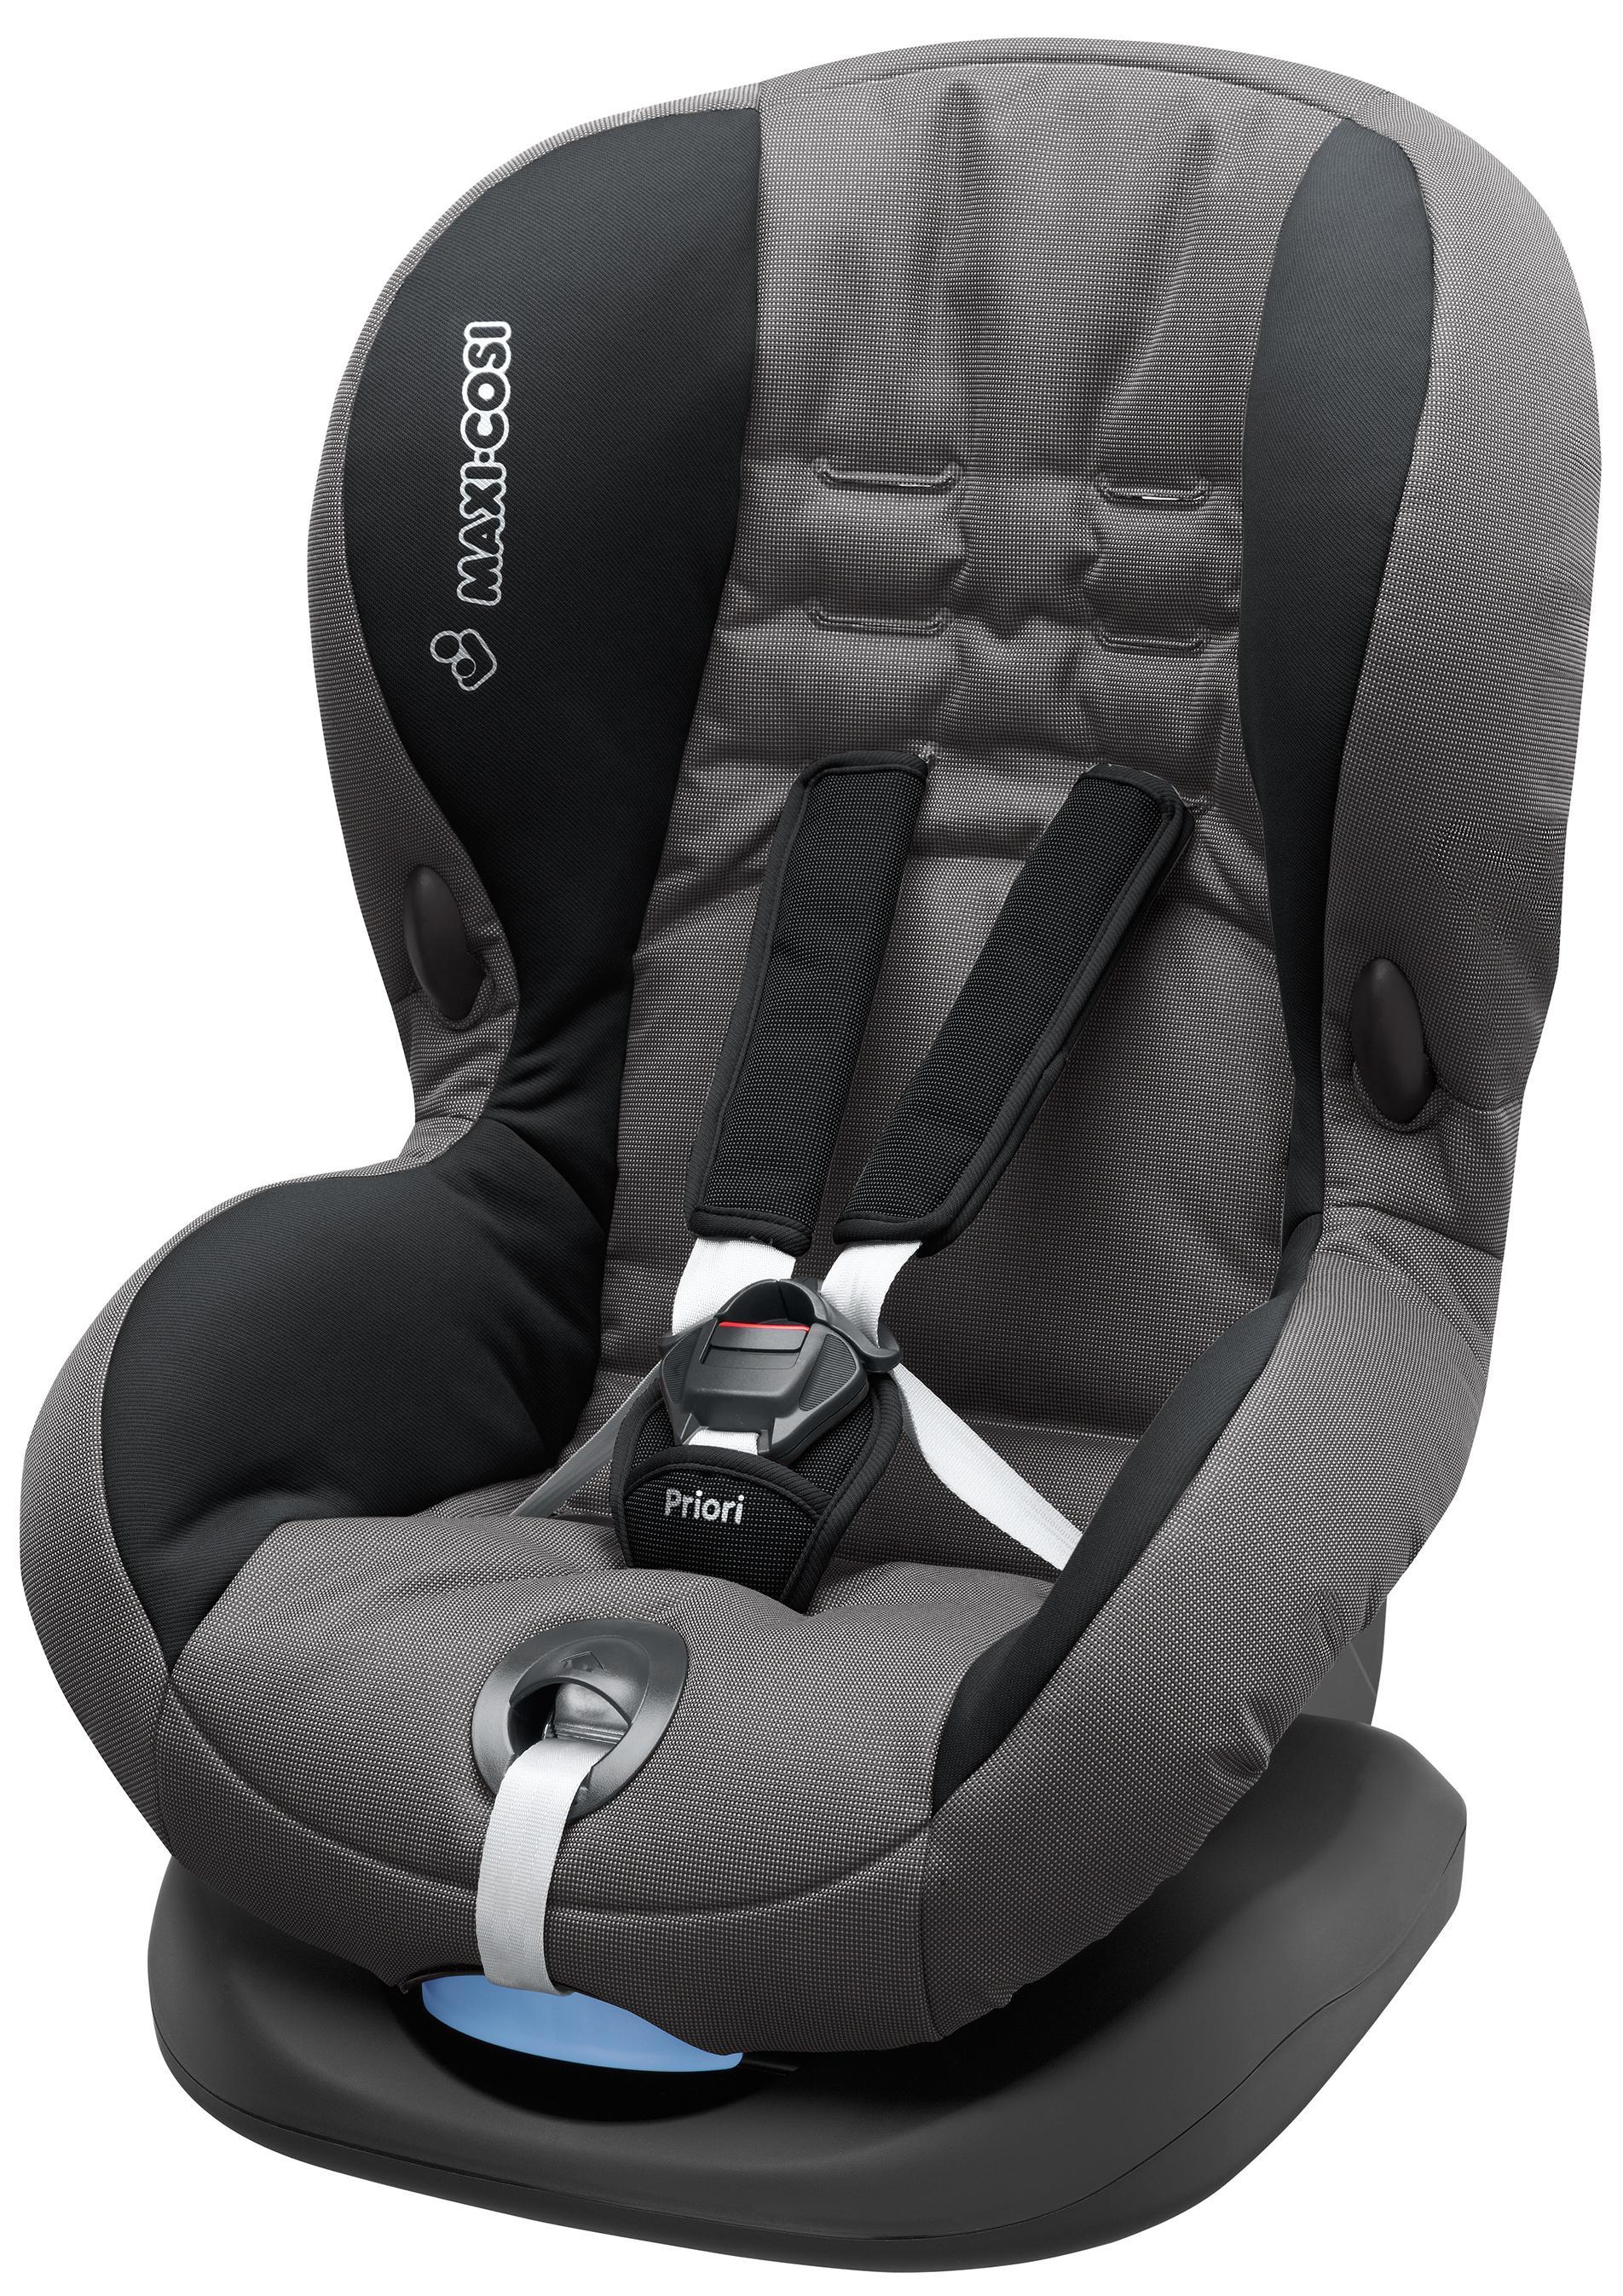 maxi cosi priori sps child car seat group 1 bjorn ebay. Black Bedroom Furniture Sets. Home Design Ideas